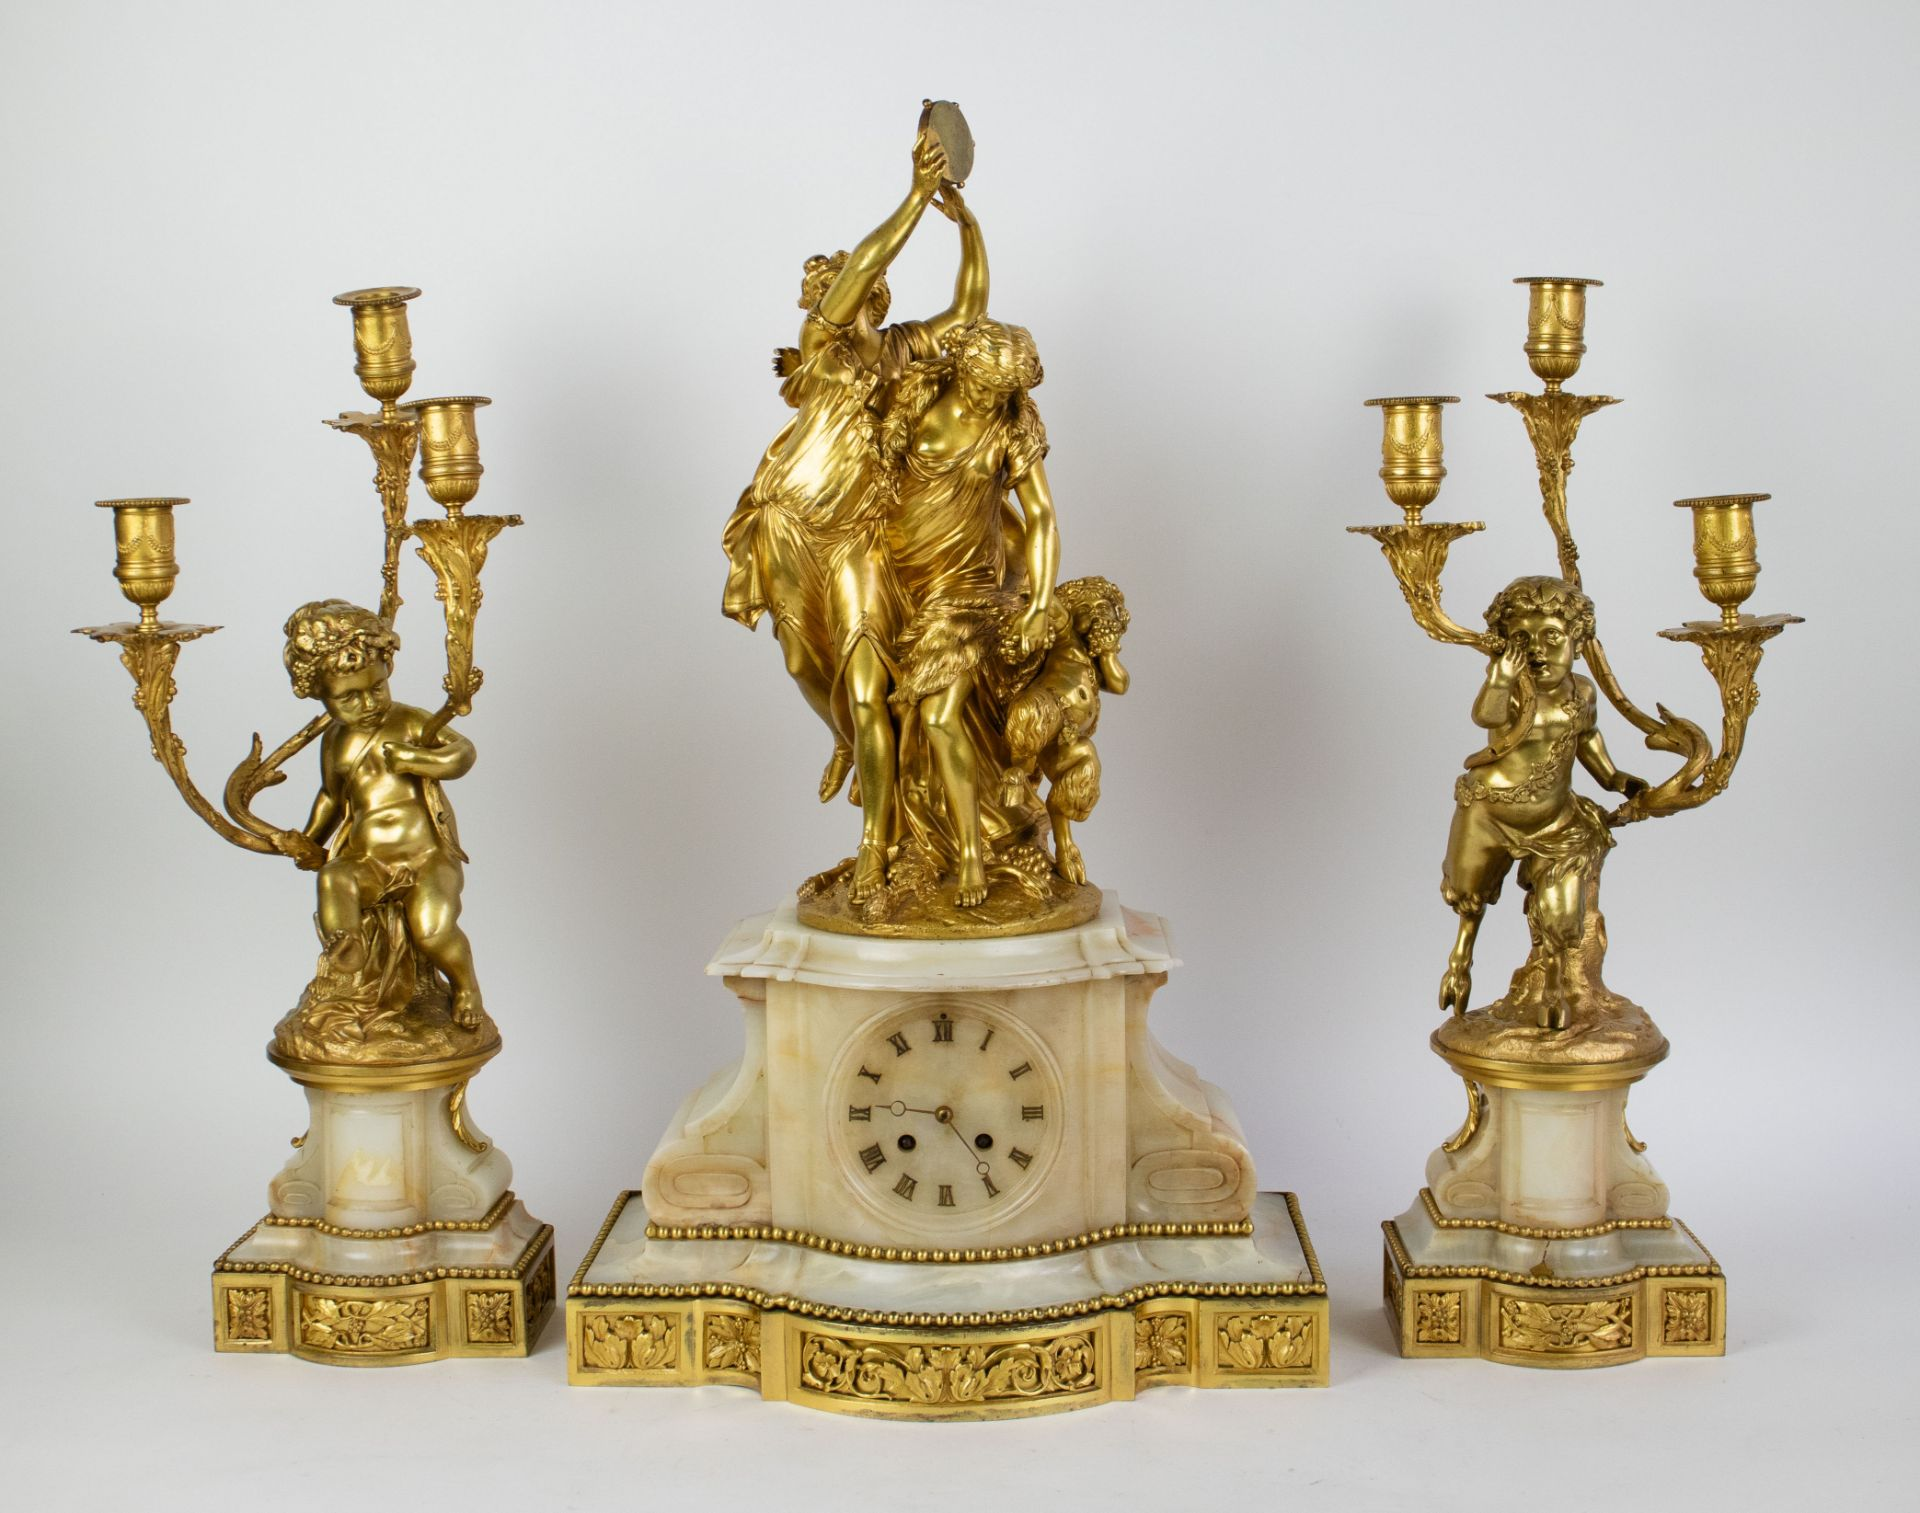 Ormulu clock with candelabra